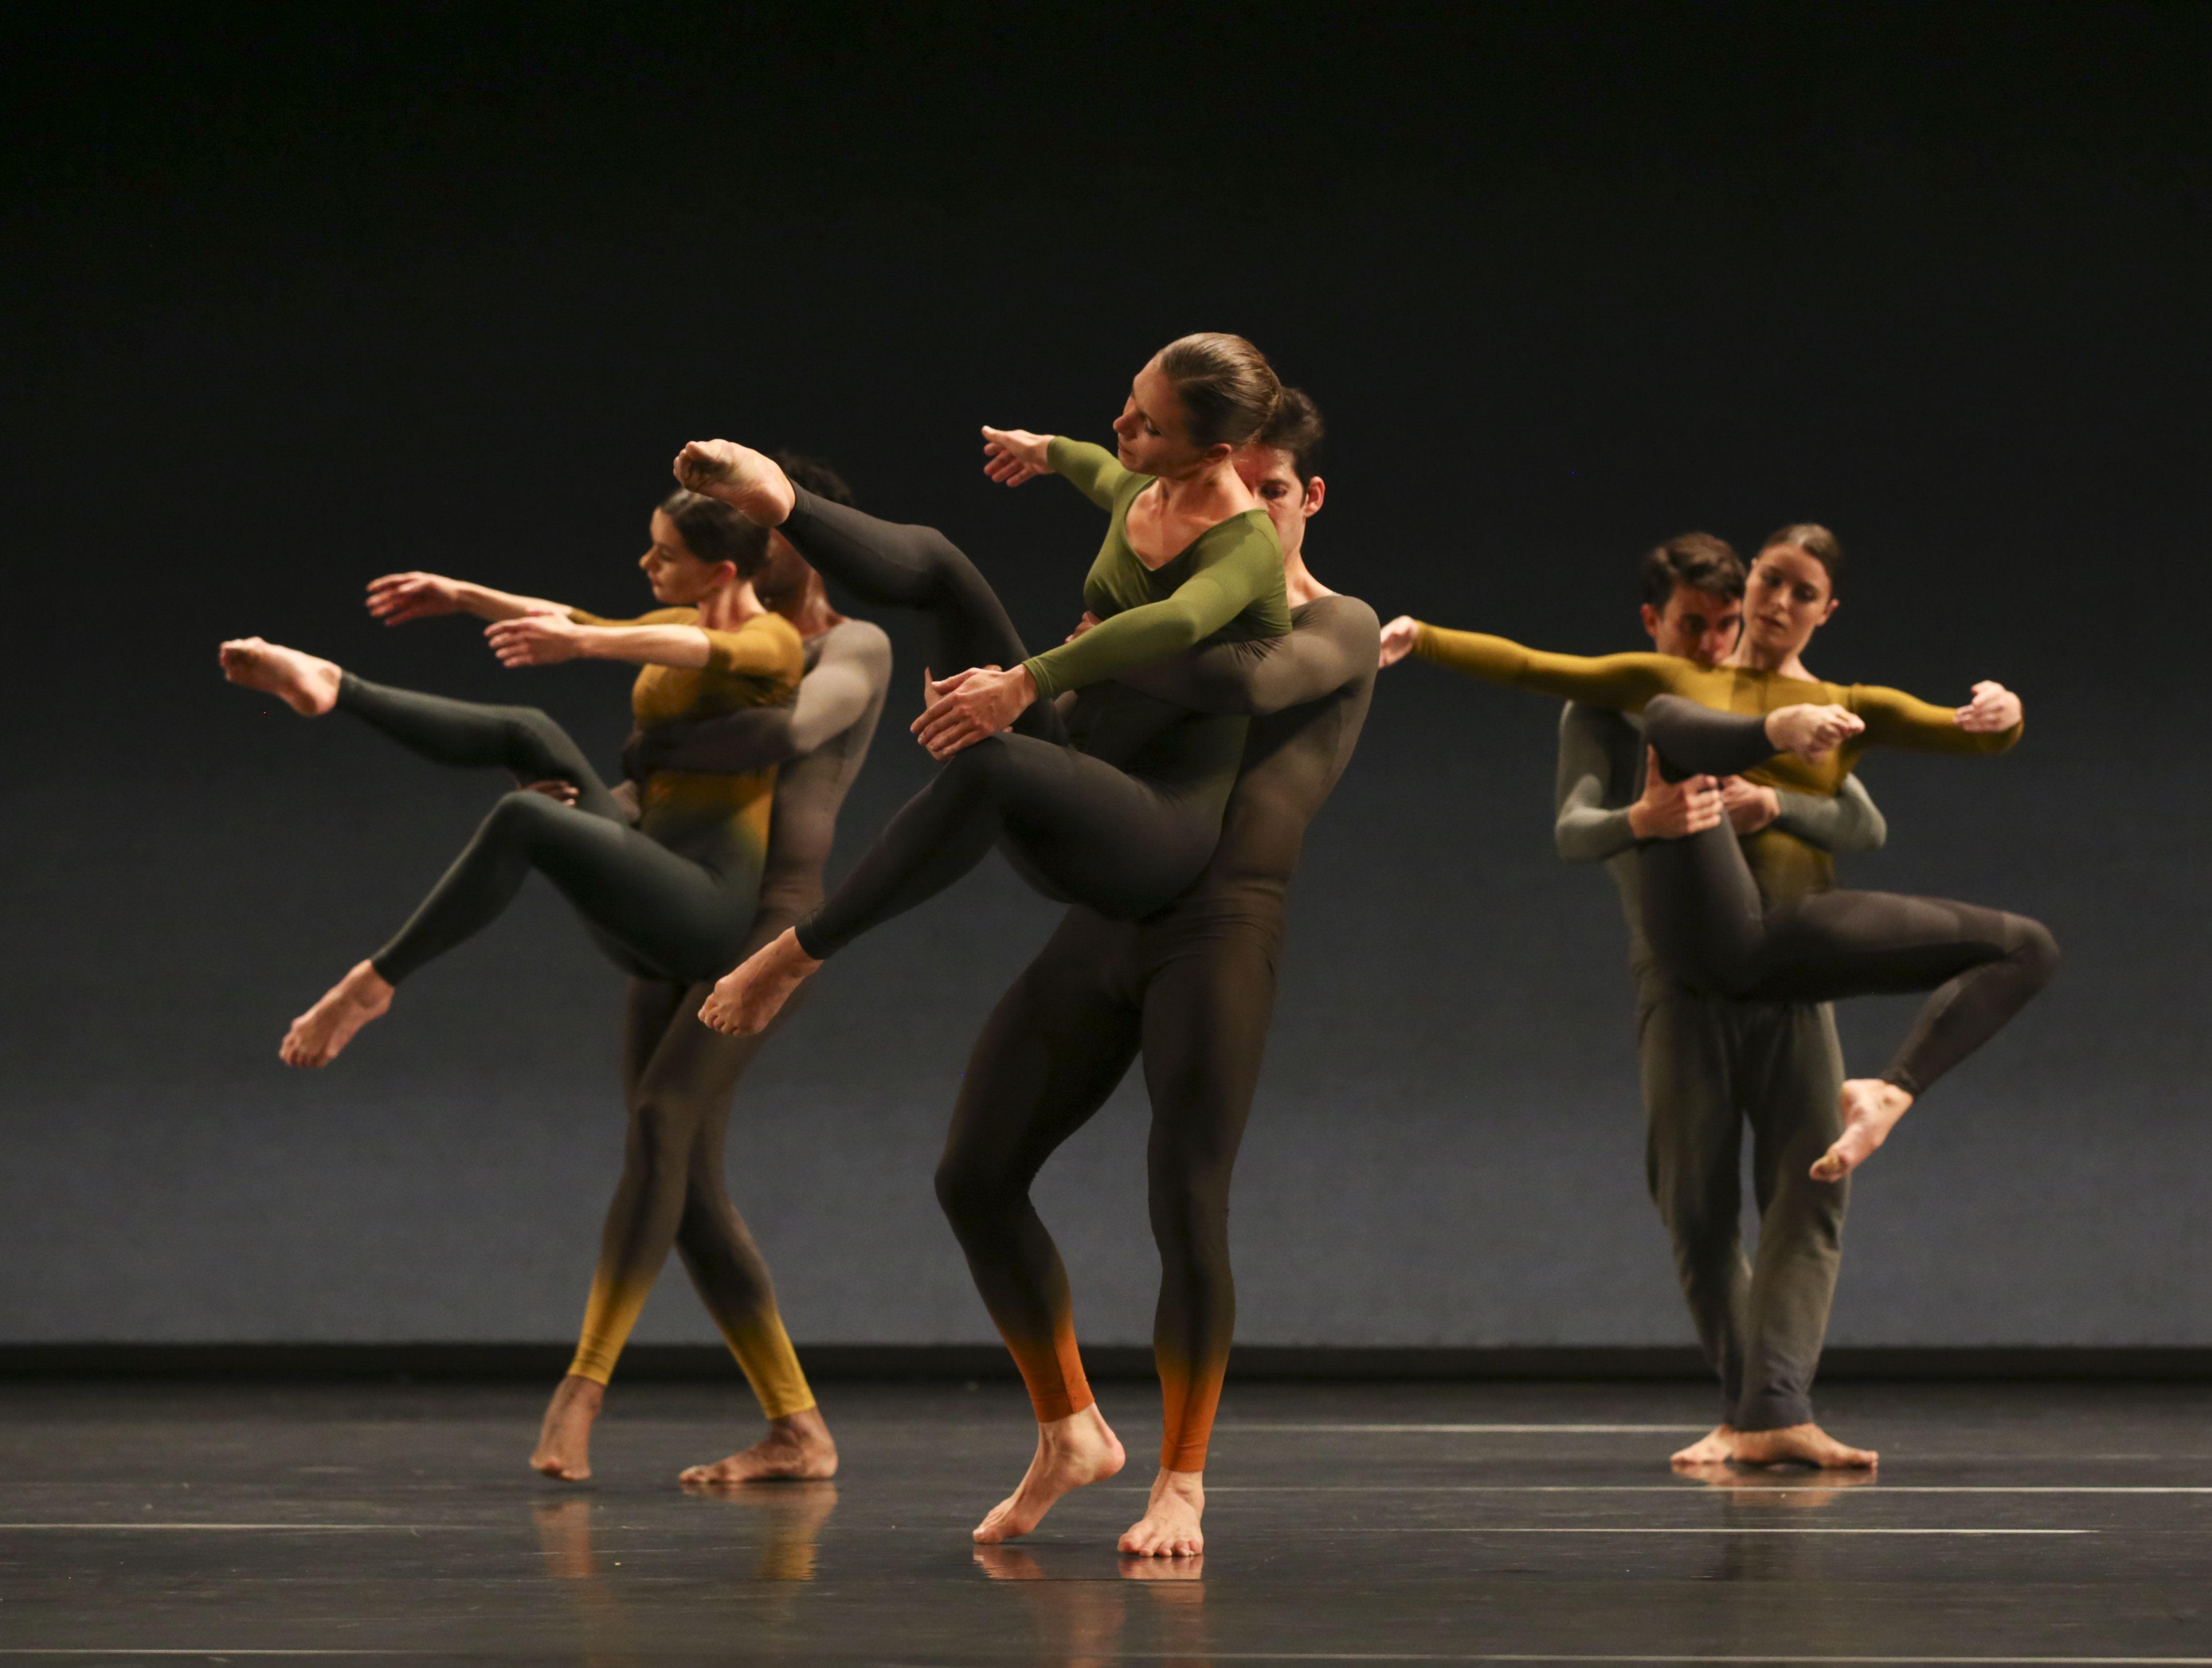 Festival Montpellier Danse - Ballet de l'Opéra de Lyon - Merce Cunningham